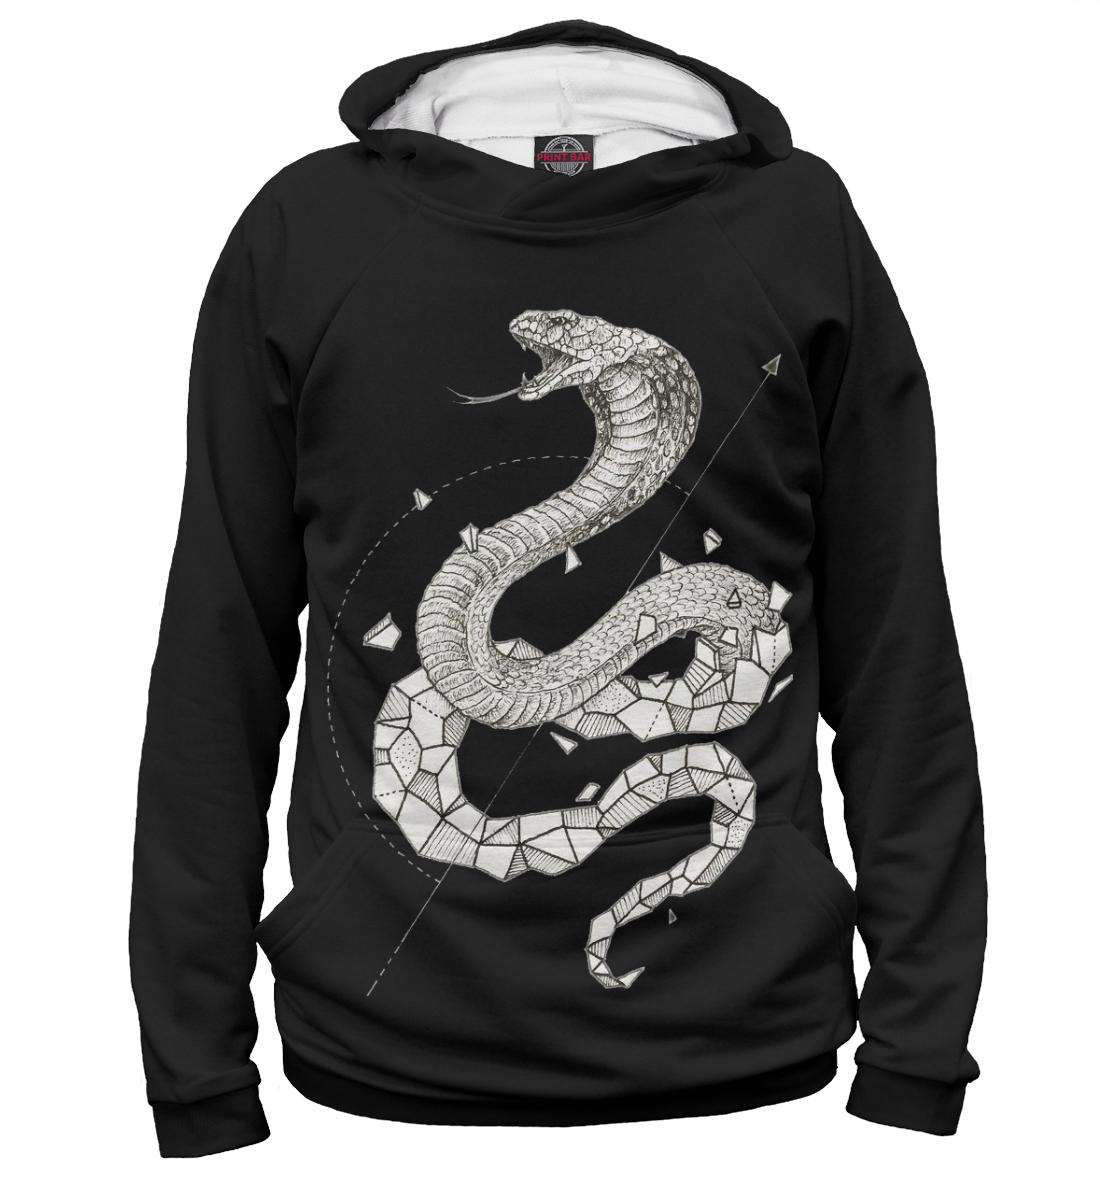 Купить Geometric dark snake, Printbar, Худи, APD-154964-hud-1